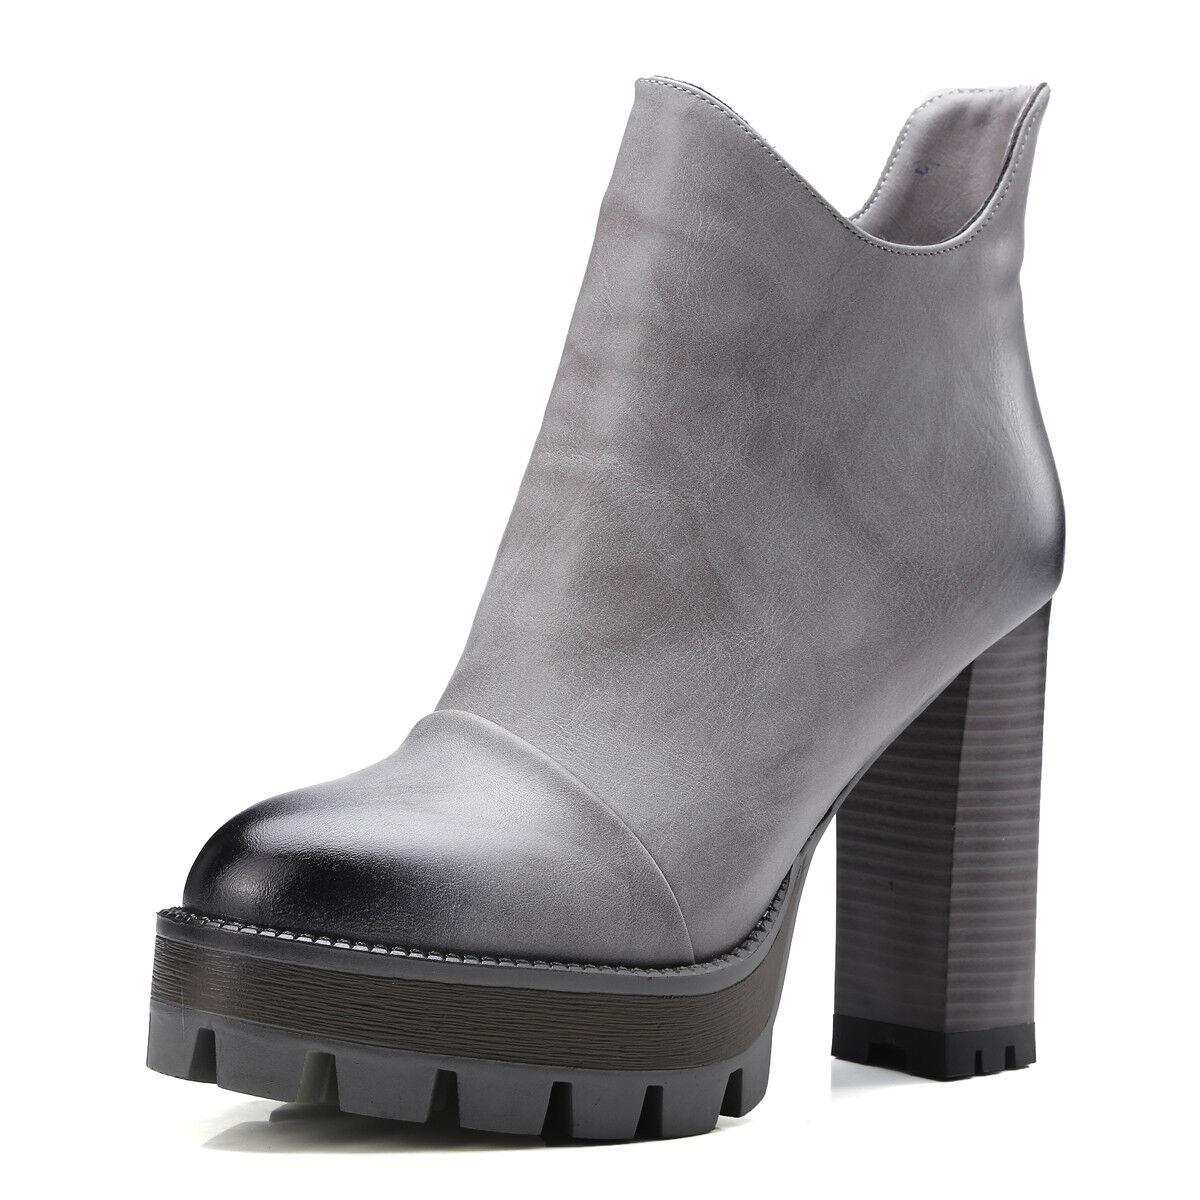 Retro Womens Leather Ankle Boots Casual Platform Platform Platform Side Zip Block High Heels Shoes a7f18e